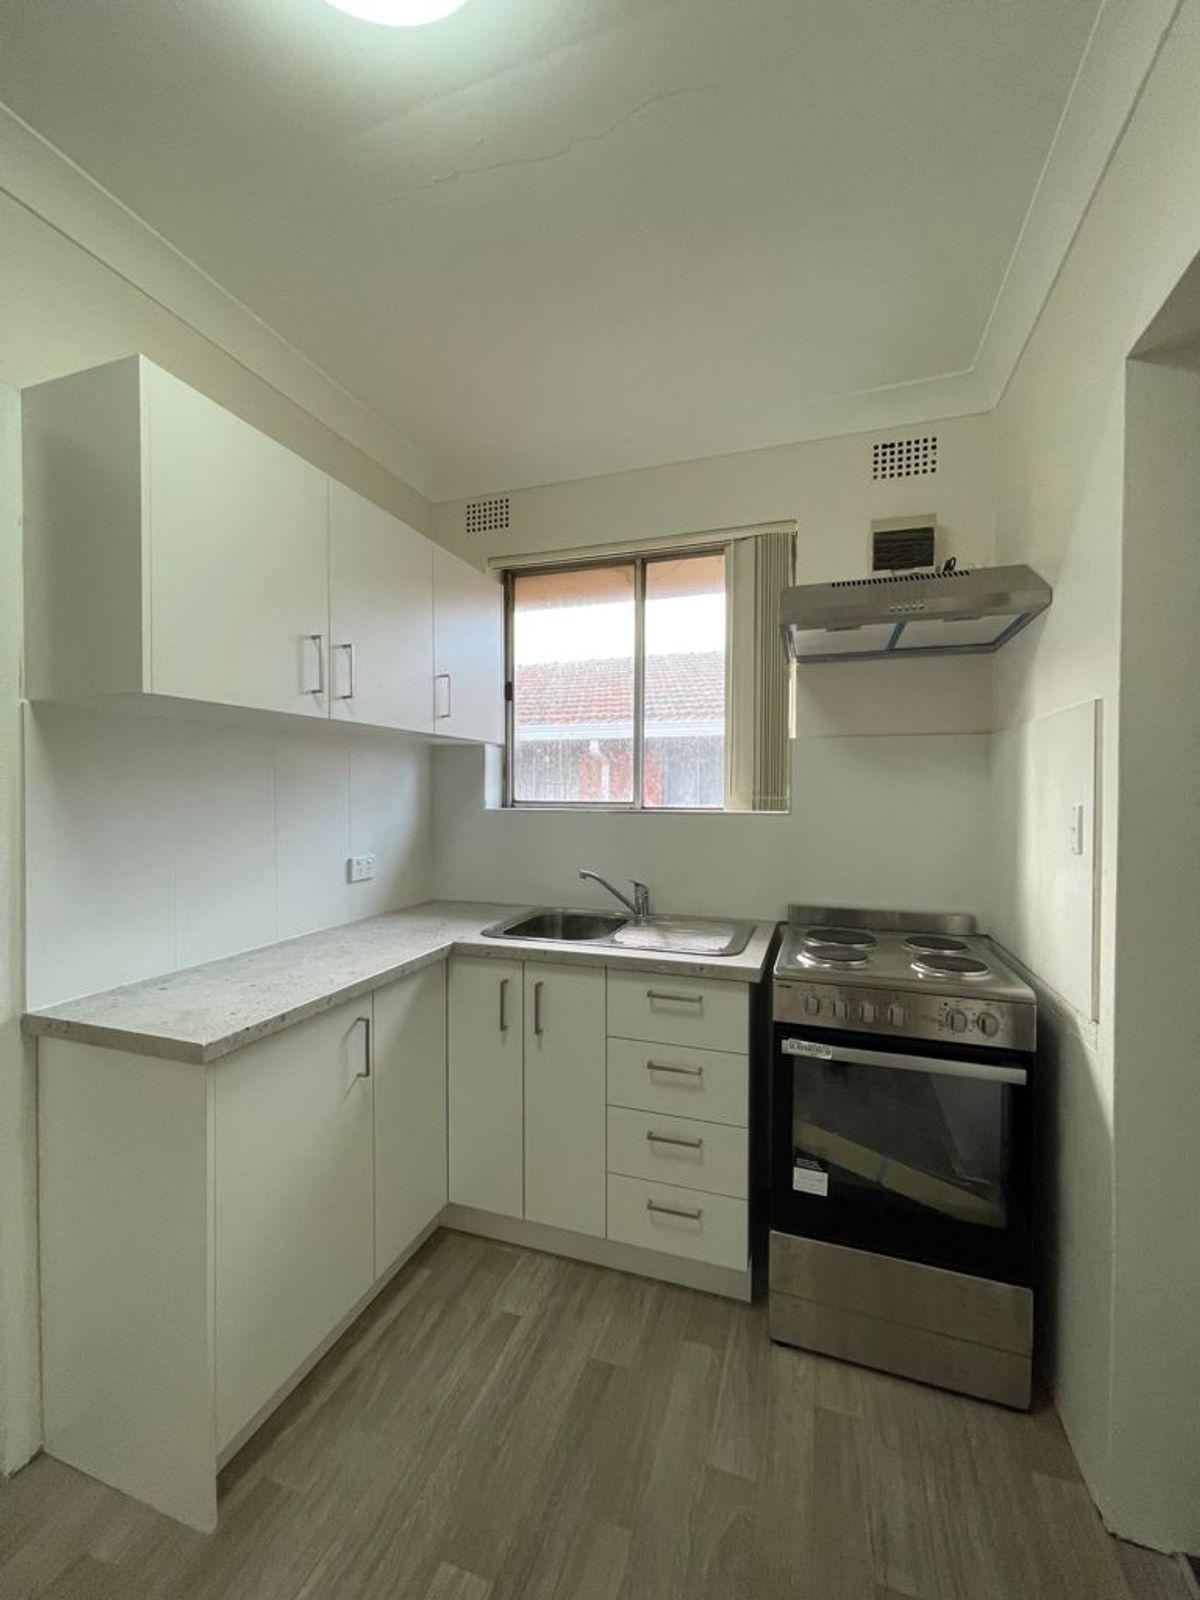 8/12 Dartbrook Road, Auburn, NSW 2144